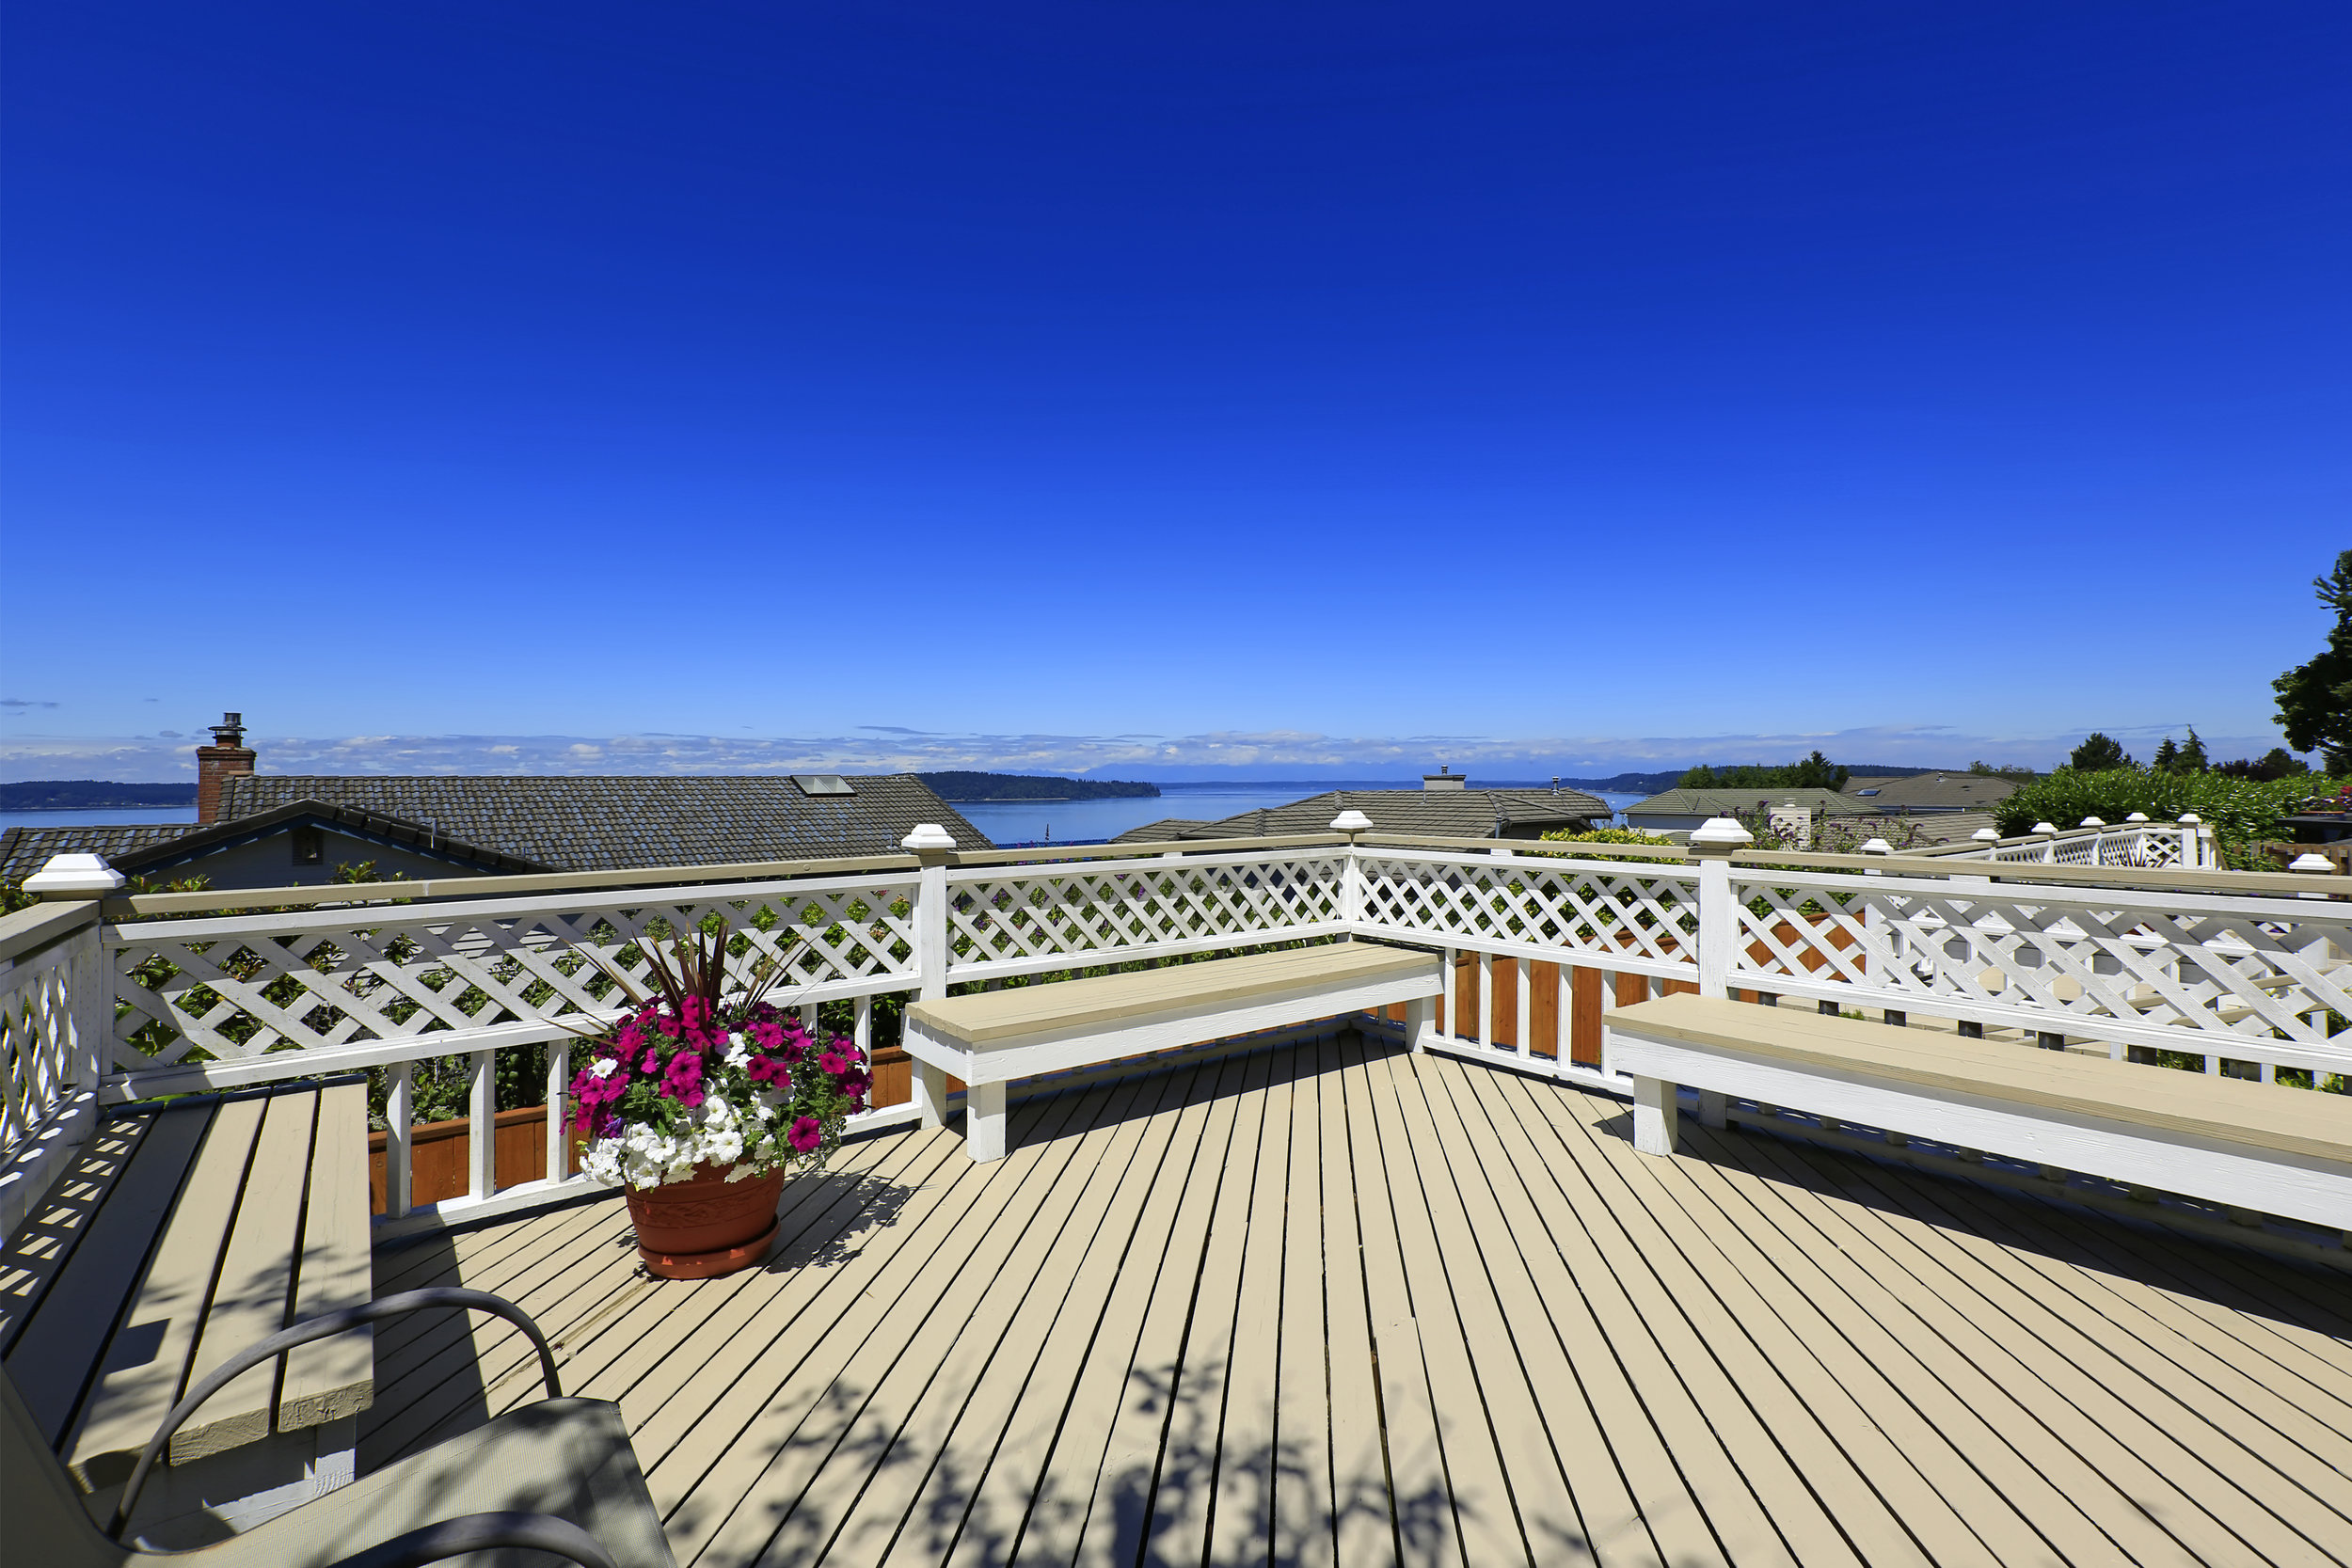 bigstock-Beautiful-Deck-With-Scenic-Bay-71372302.jpg